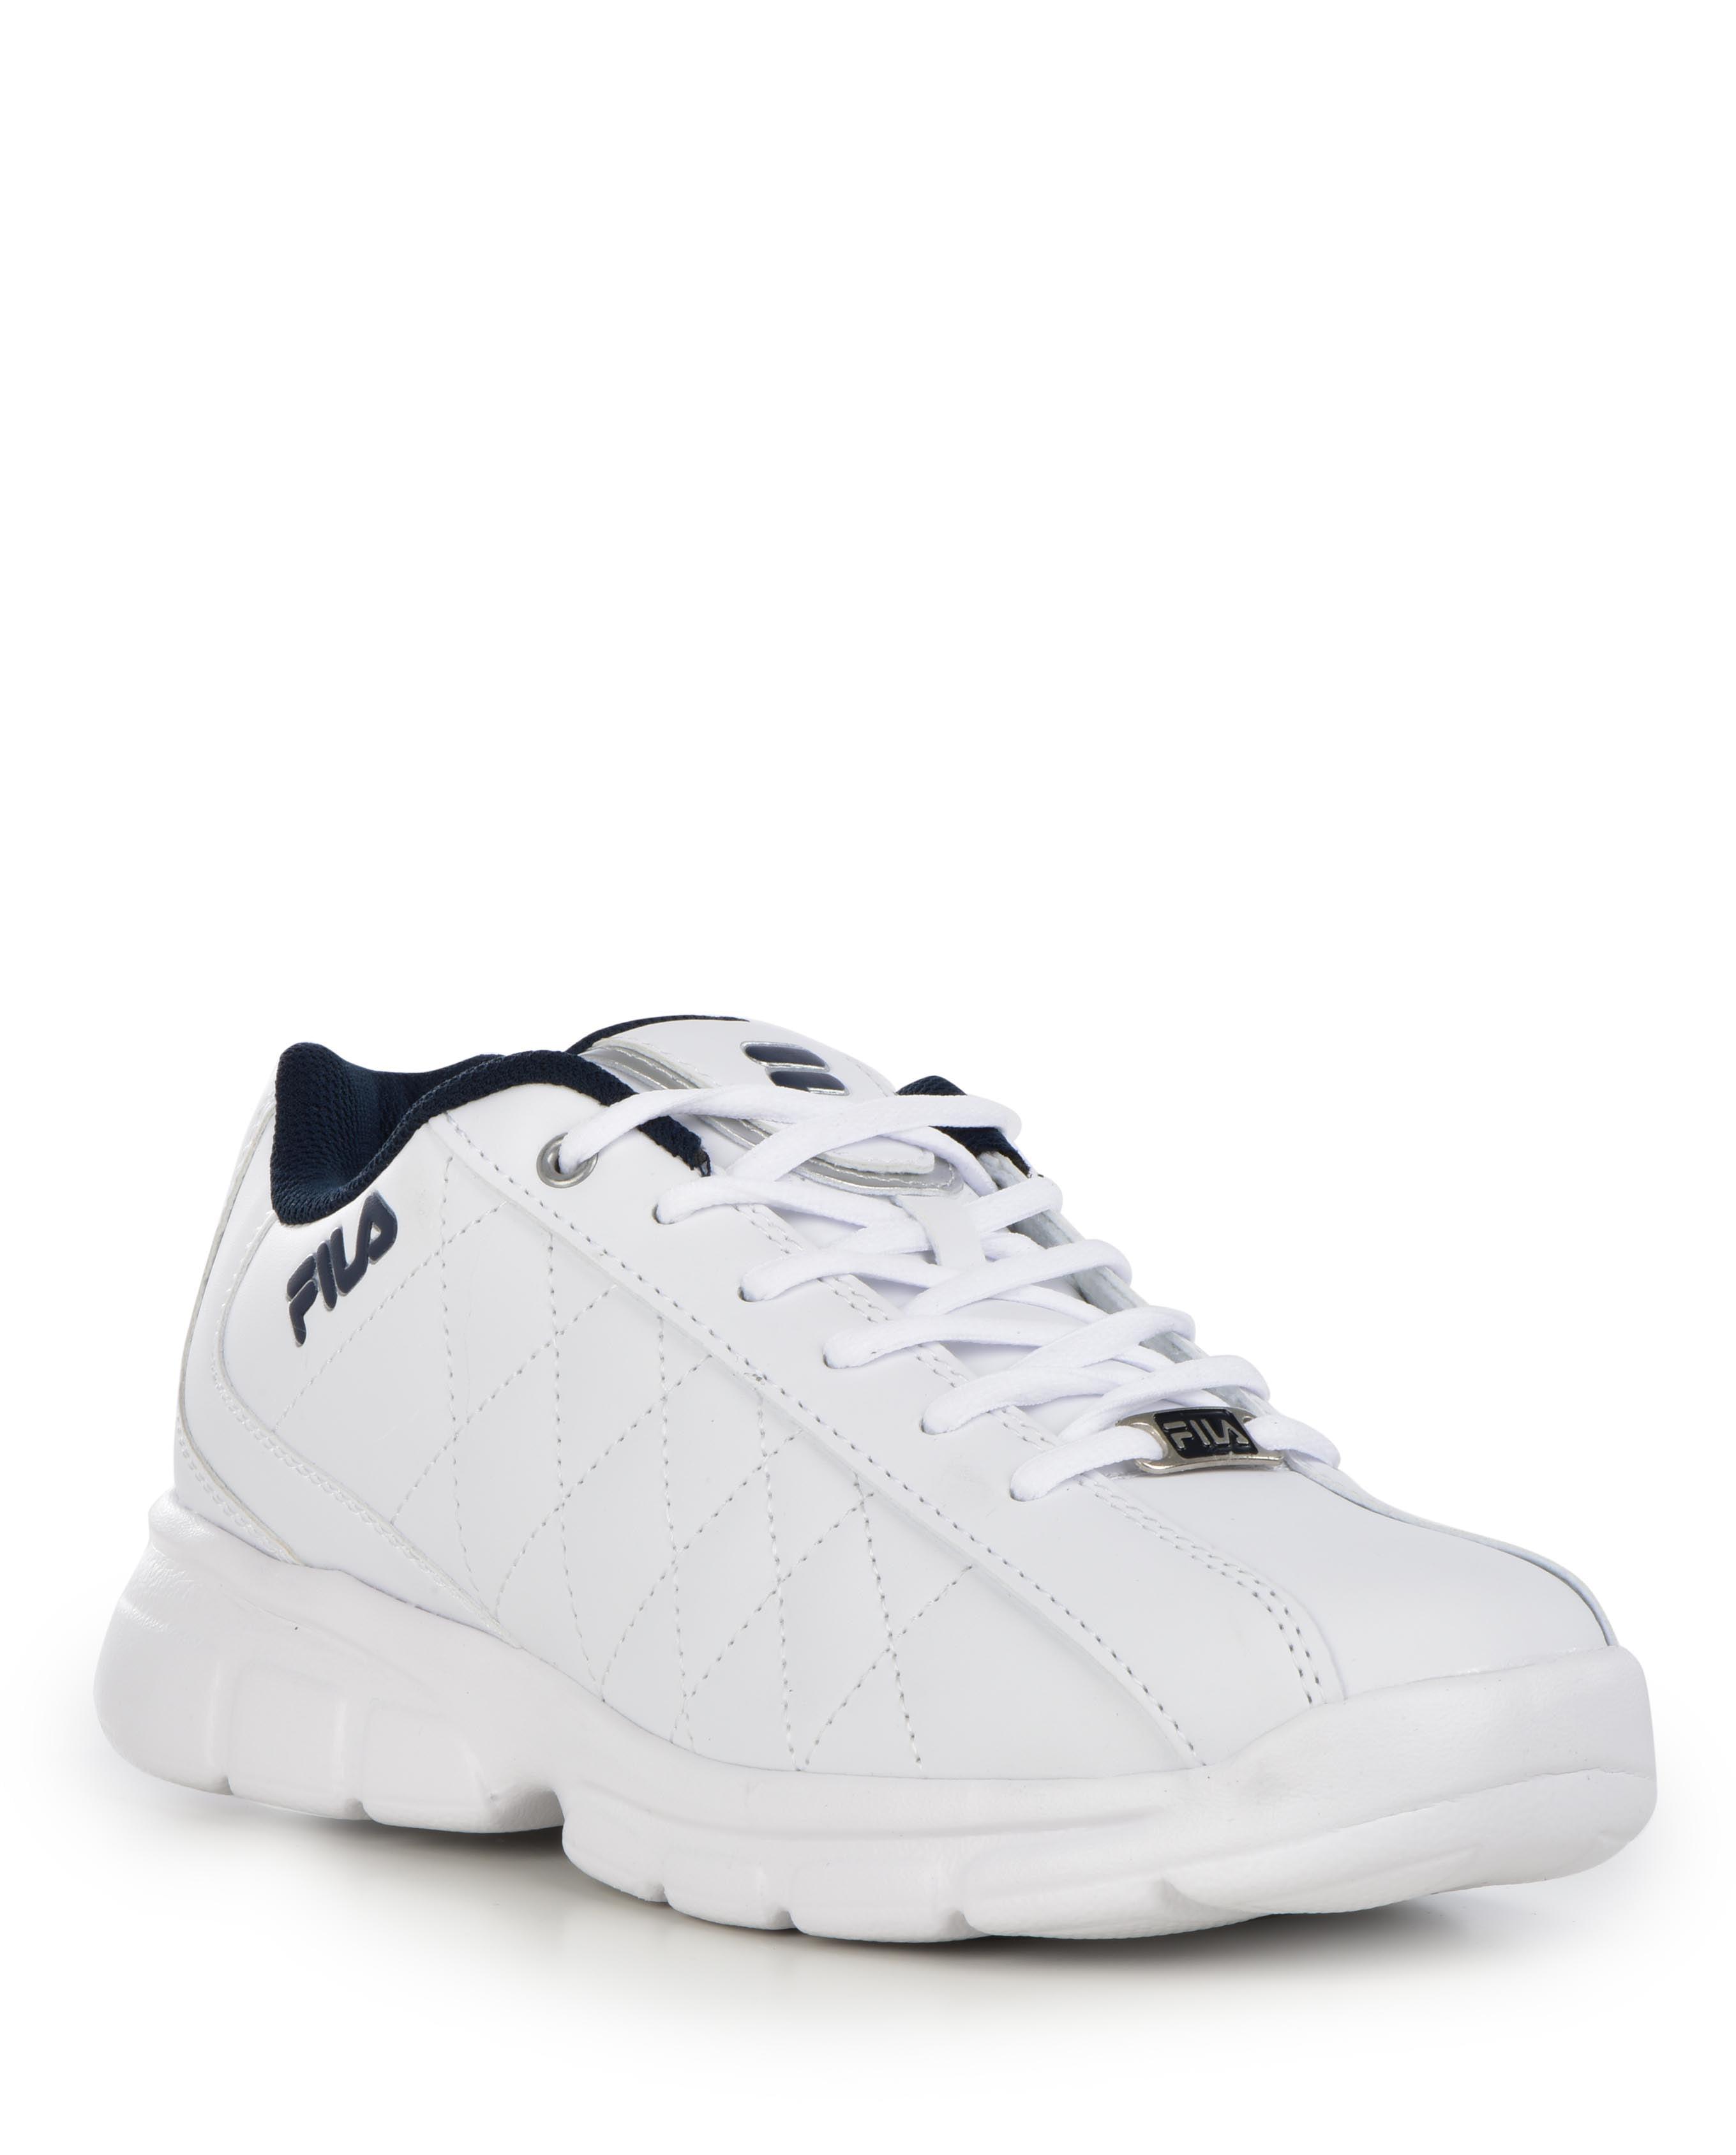 Fila Men's Fulcrum 3 Athletic Shoe by Fila